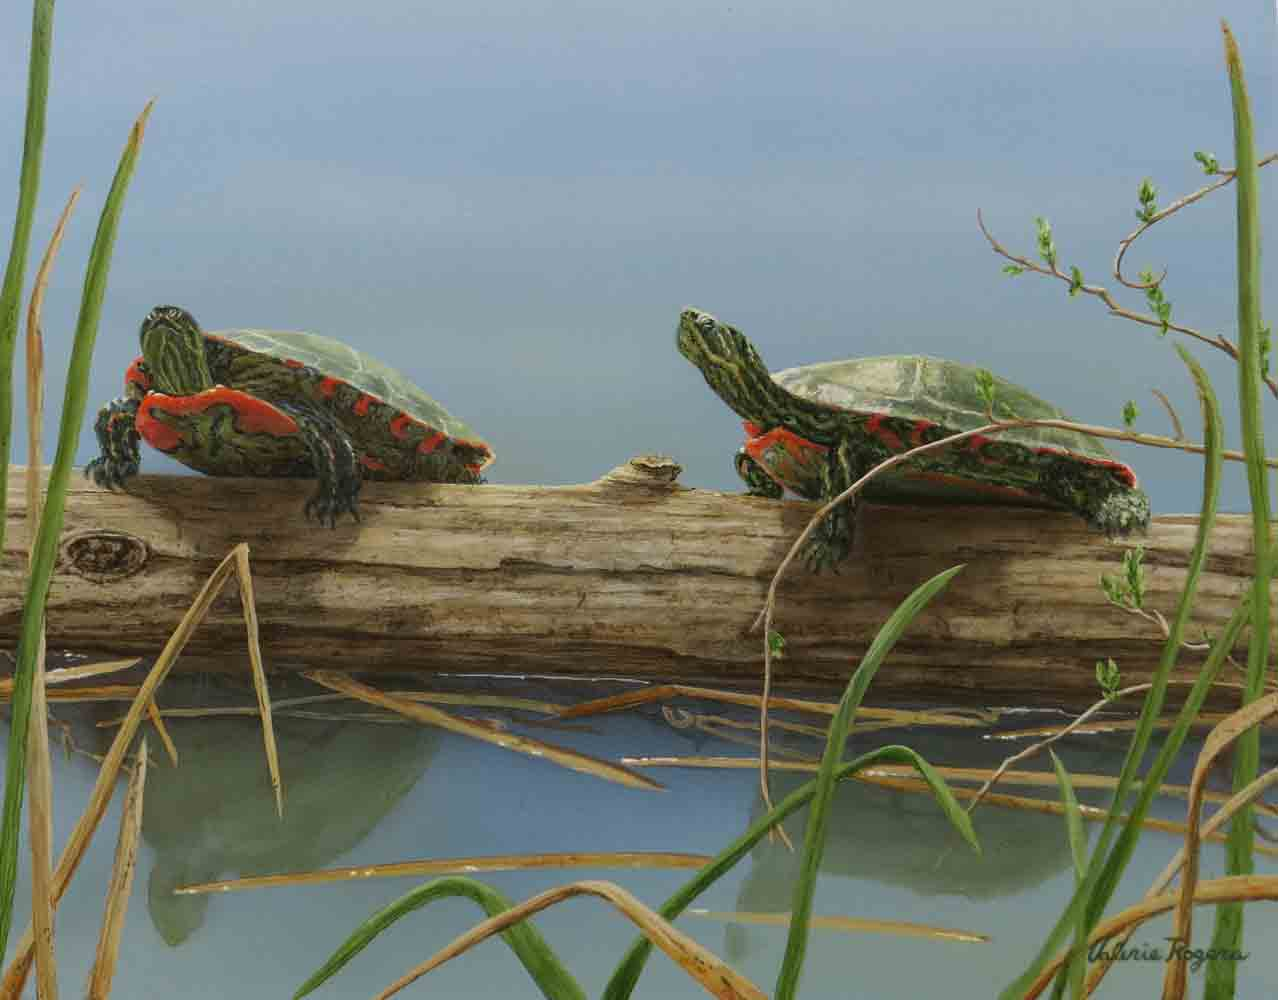 Valerie Rogers painting of painted turtles